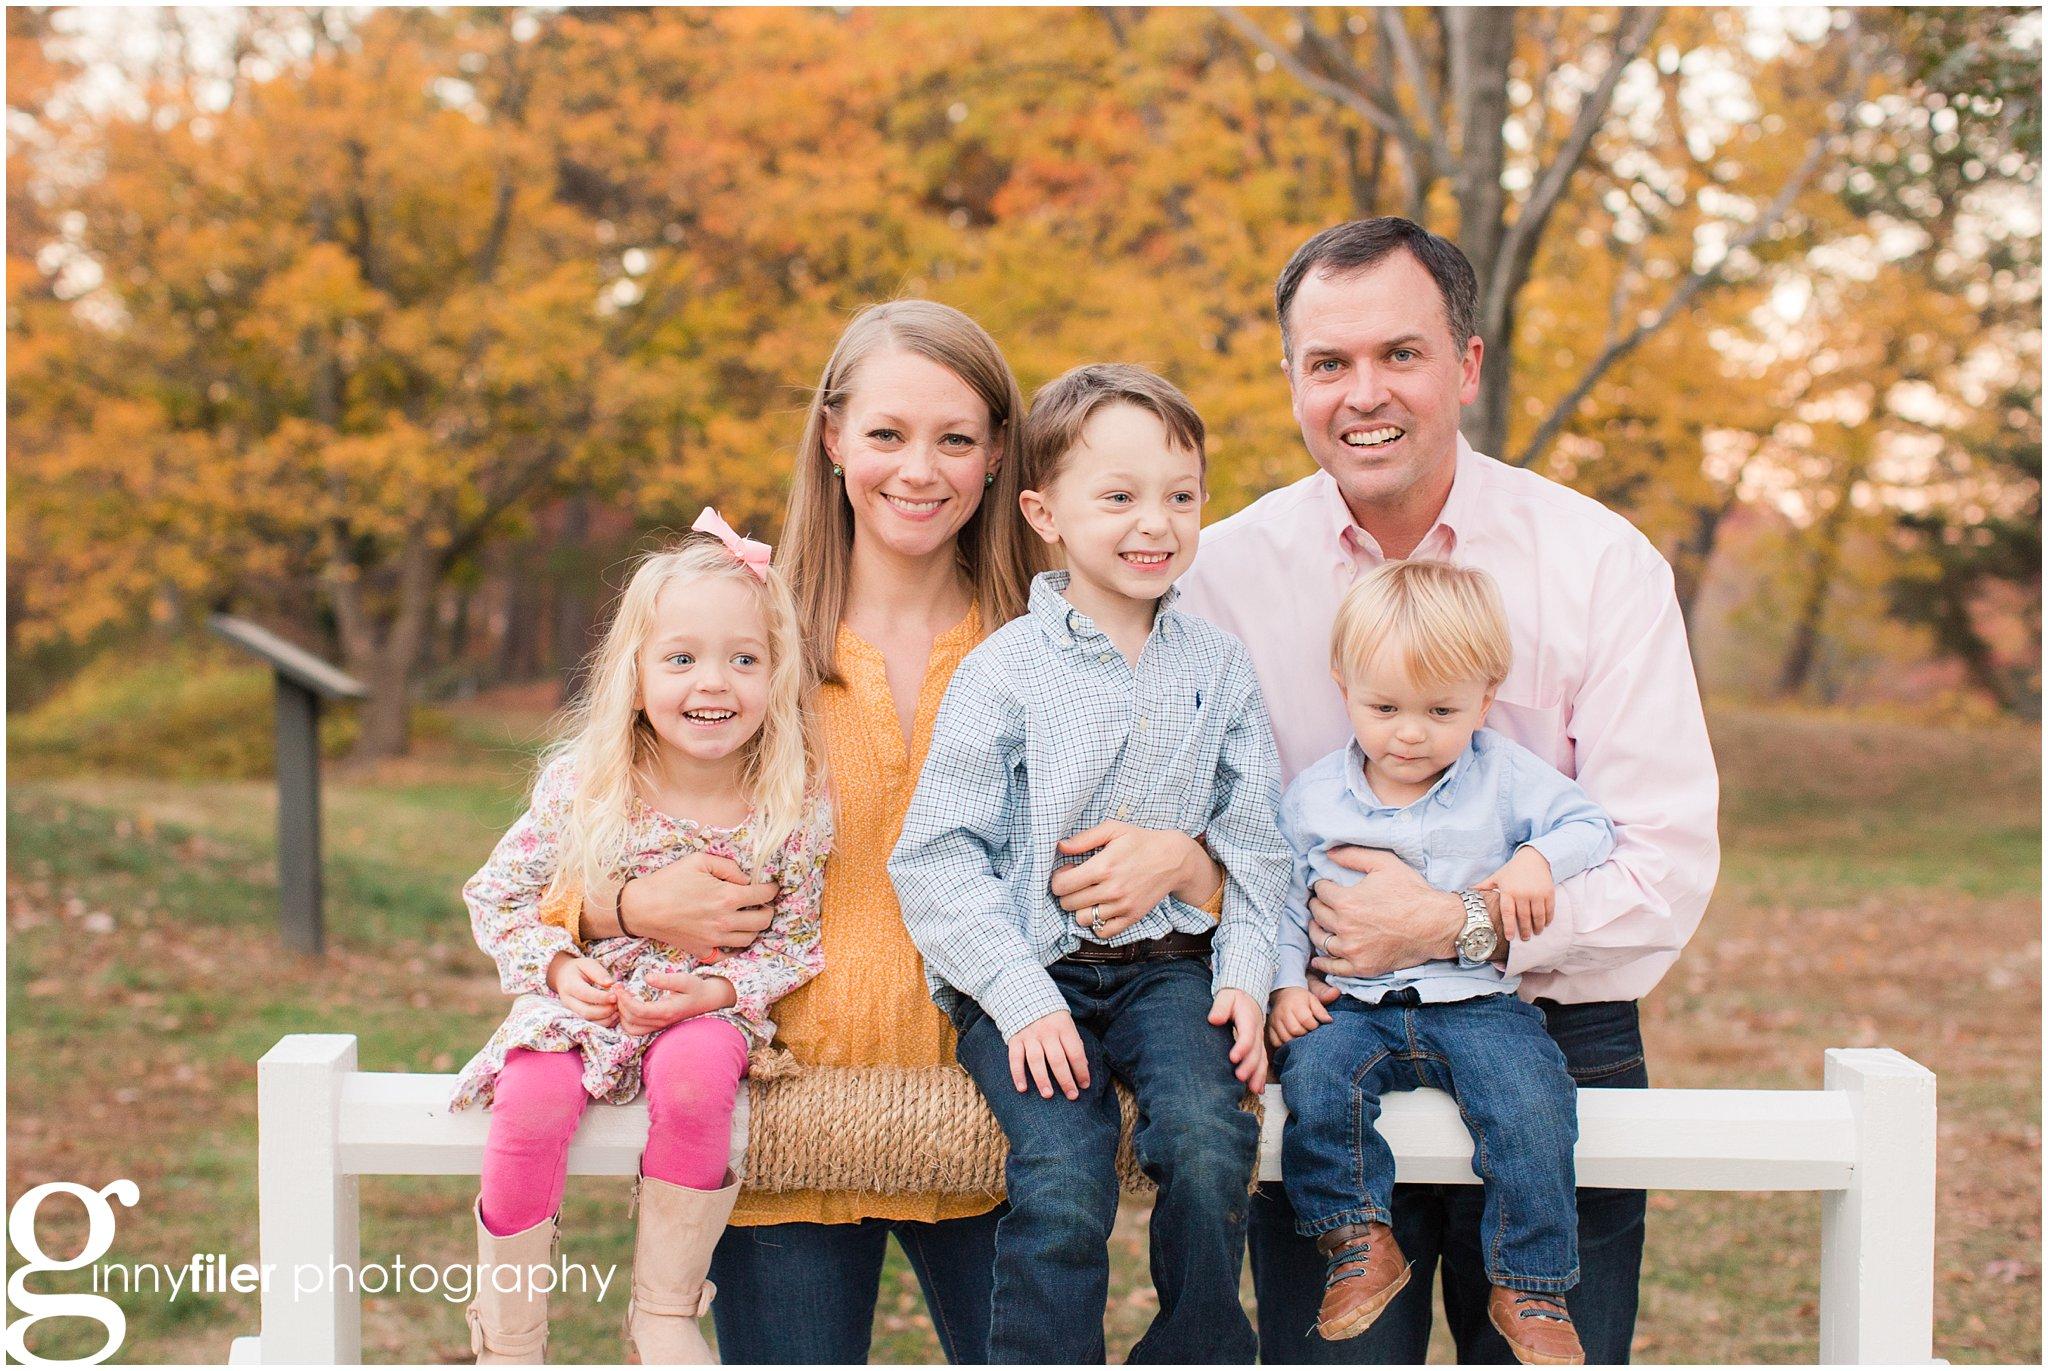 family_photography_Kennedy_0026.jpg